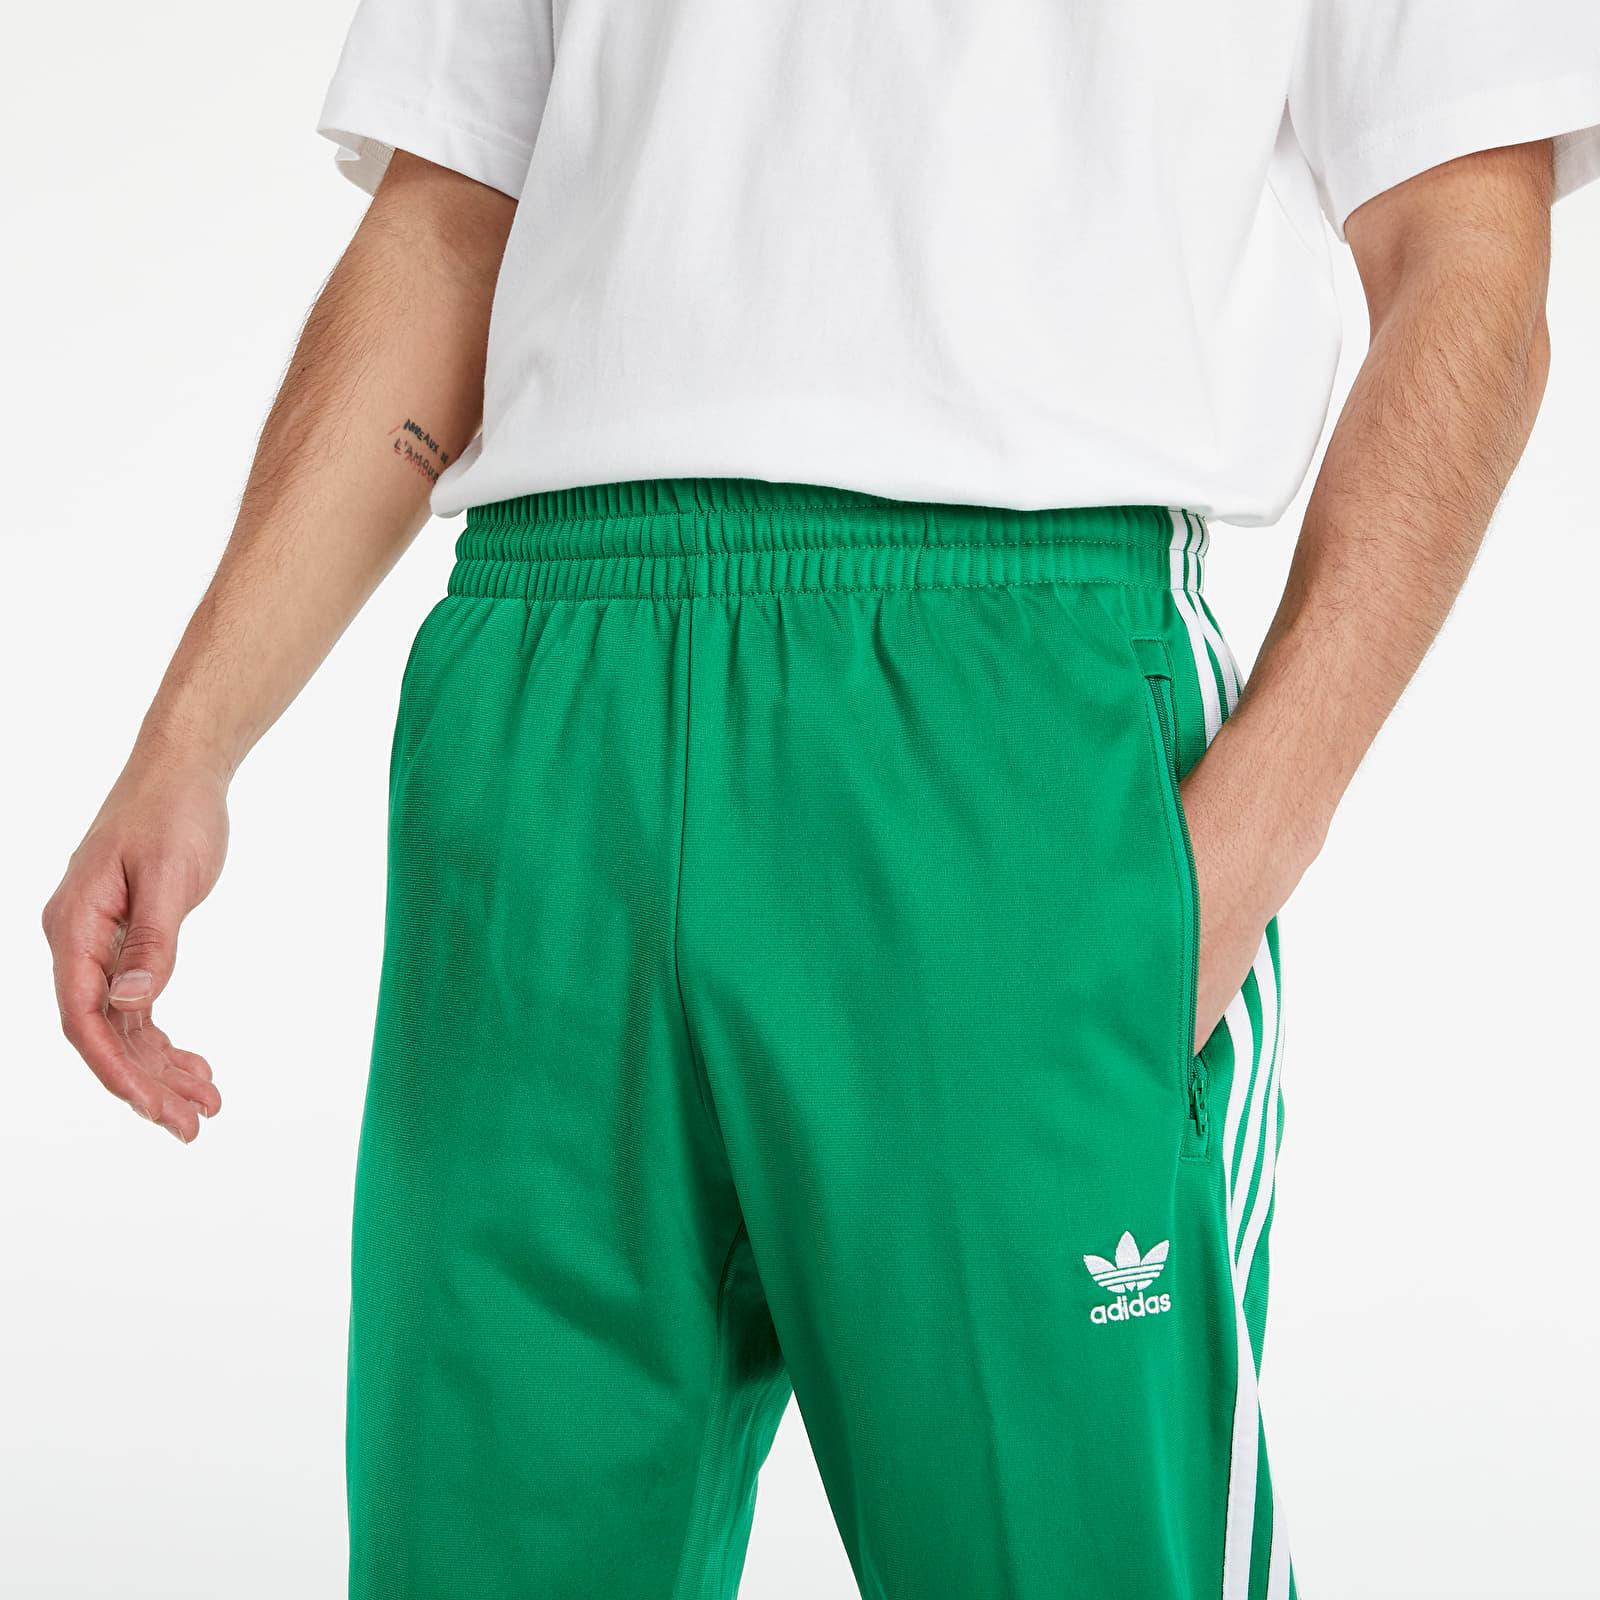 adidas Firebird Track Pants Green EUR S